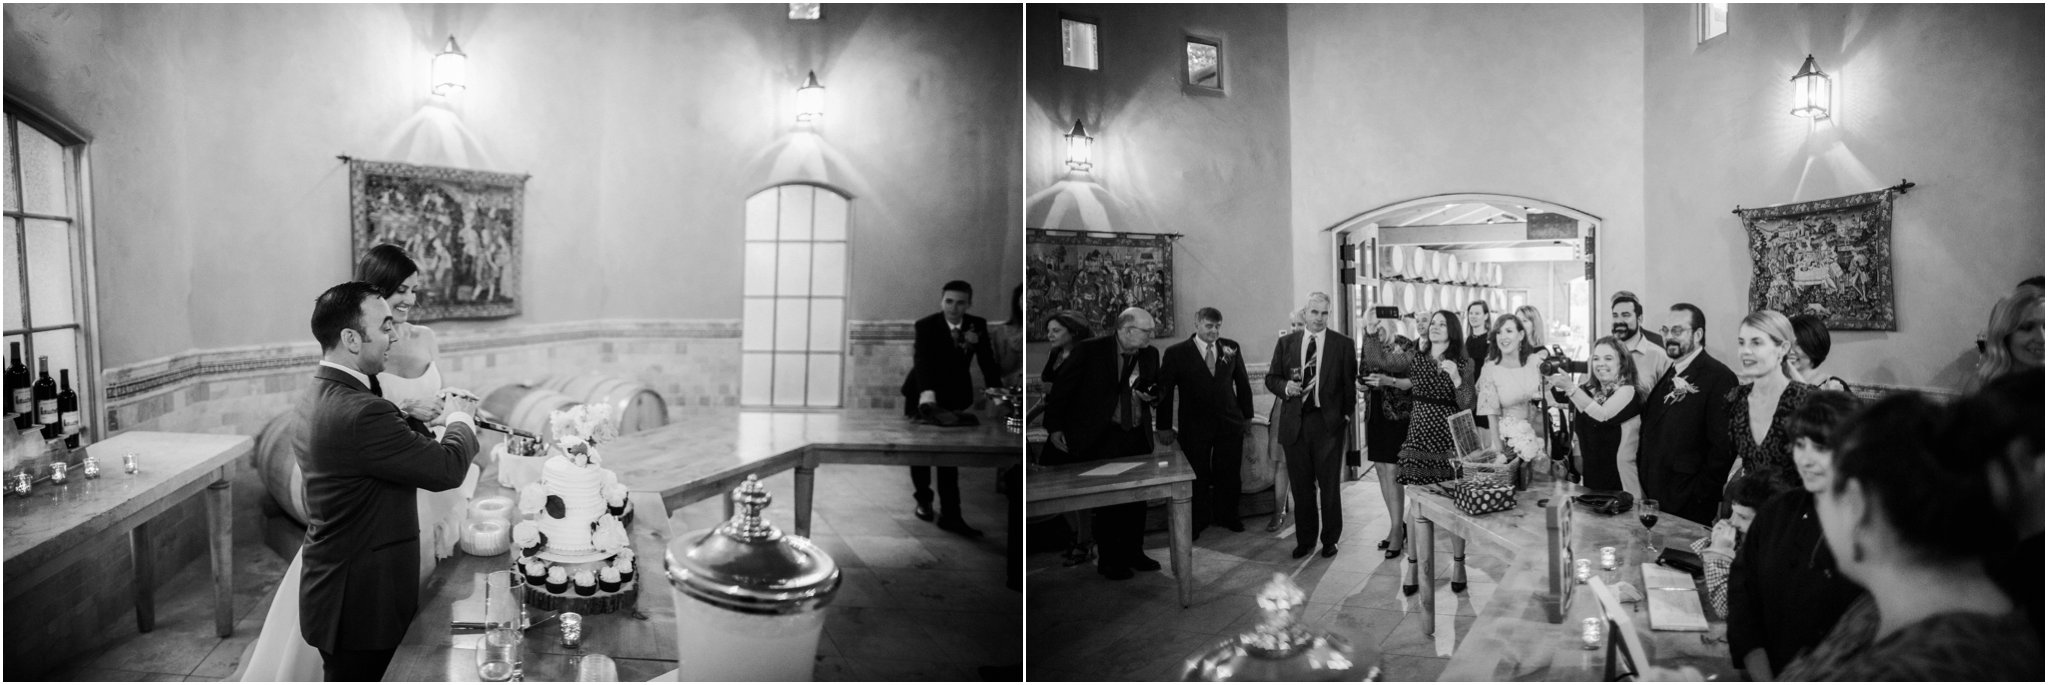 0237Casa Rodena Winery Wedding, Inn and Spa at Loretto wedding, Santa Fe wedding photographers, blue rose photography